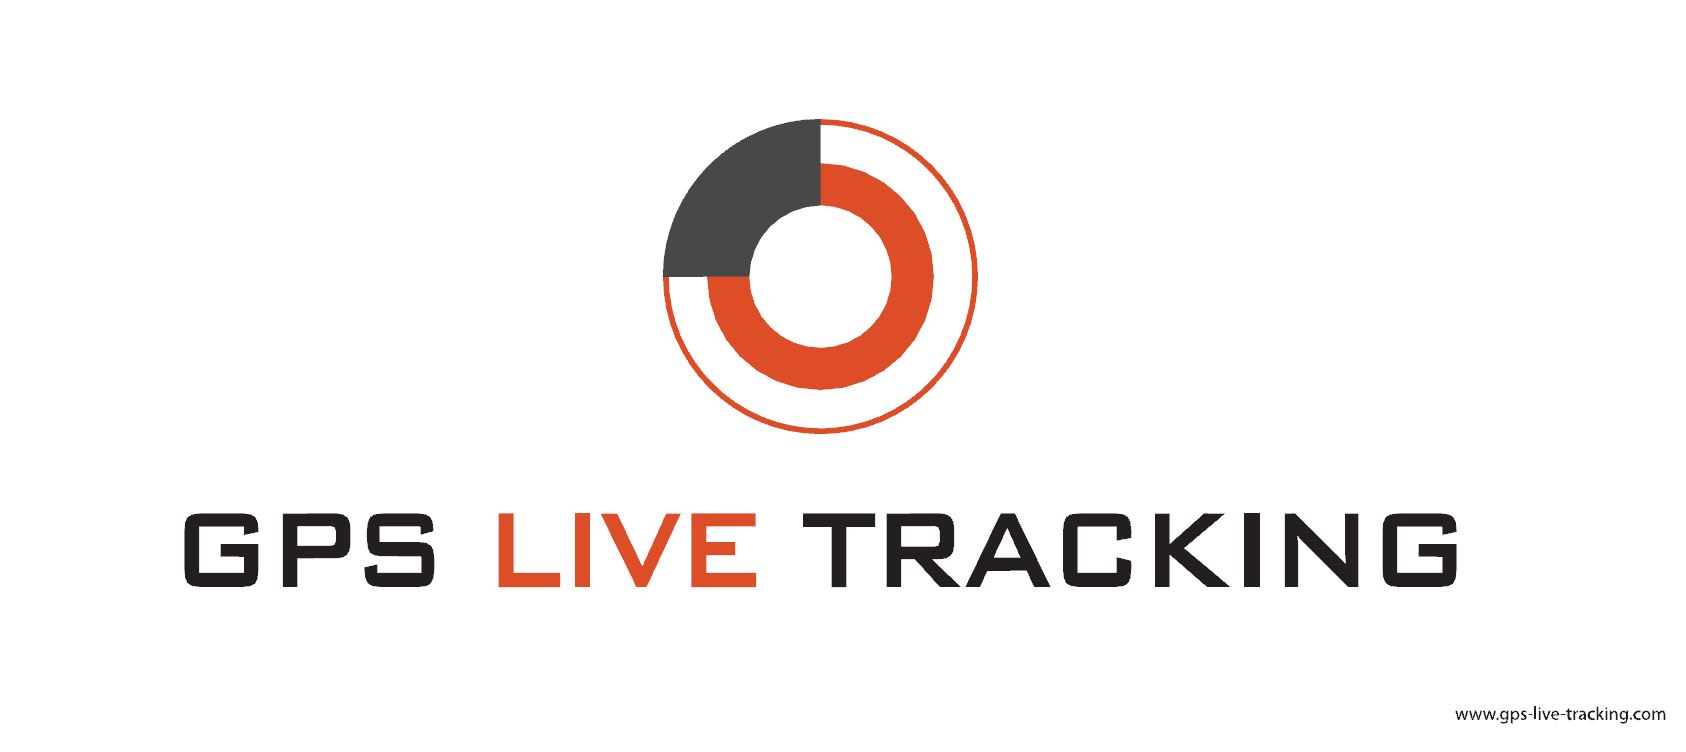 GPS live tracking Logo